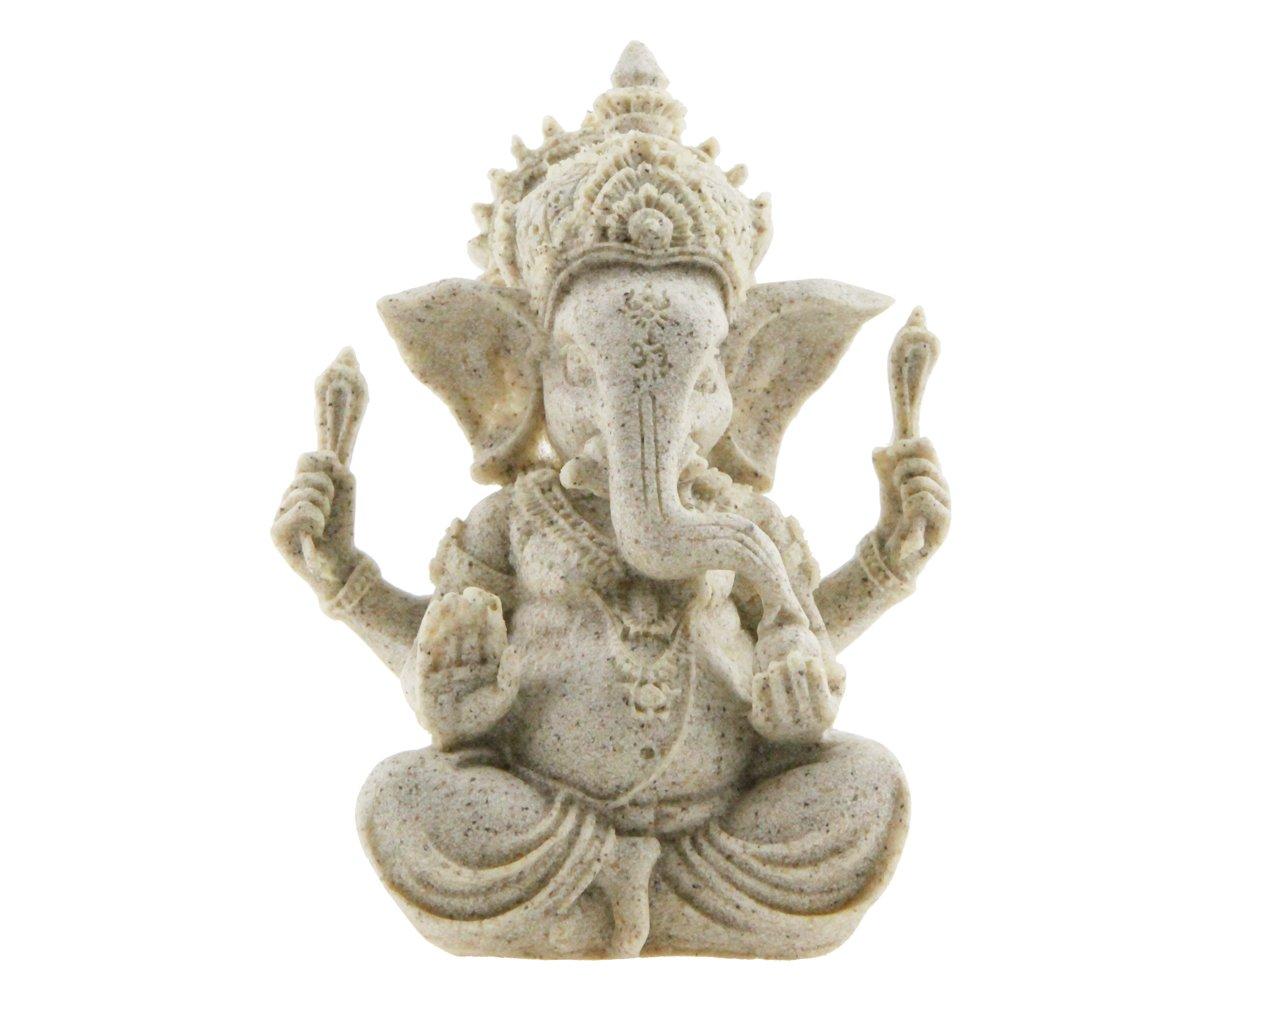 Winterworm Handmade Ganesha Elephant God Statue Sandstone Sculpture Buddha Figurine Decoration